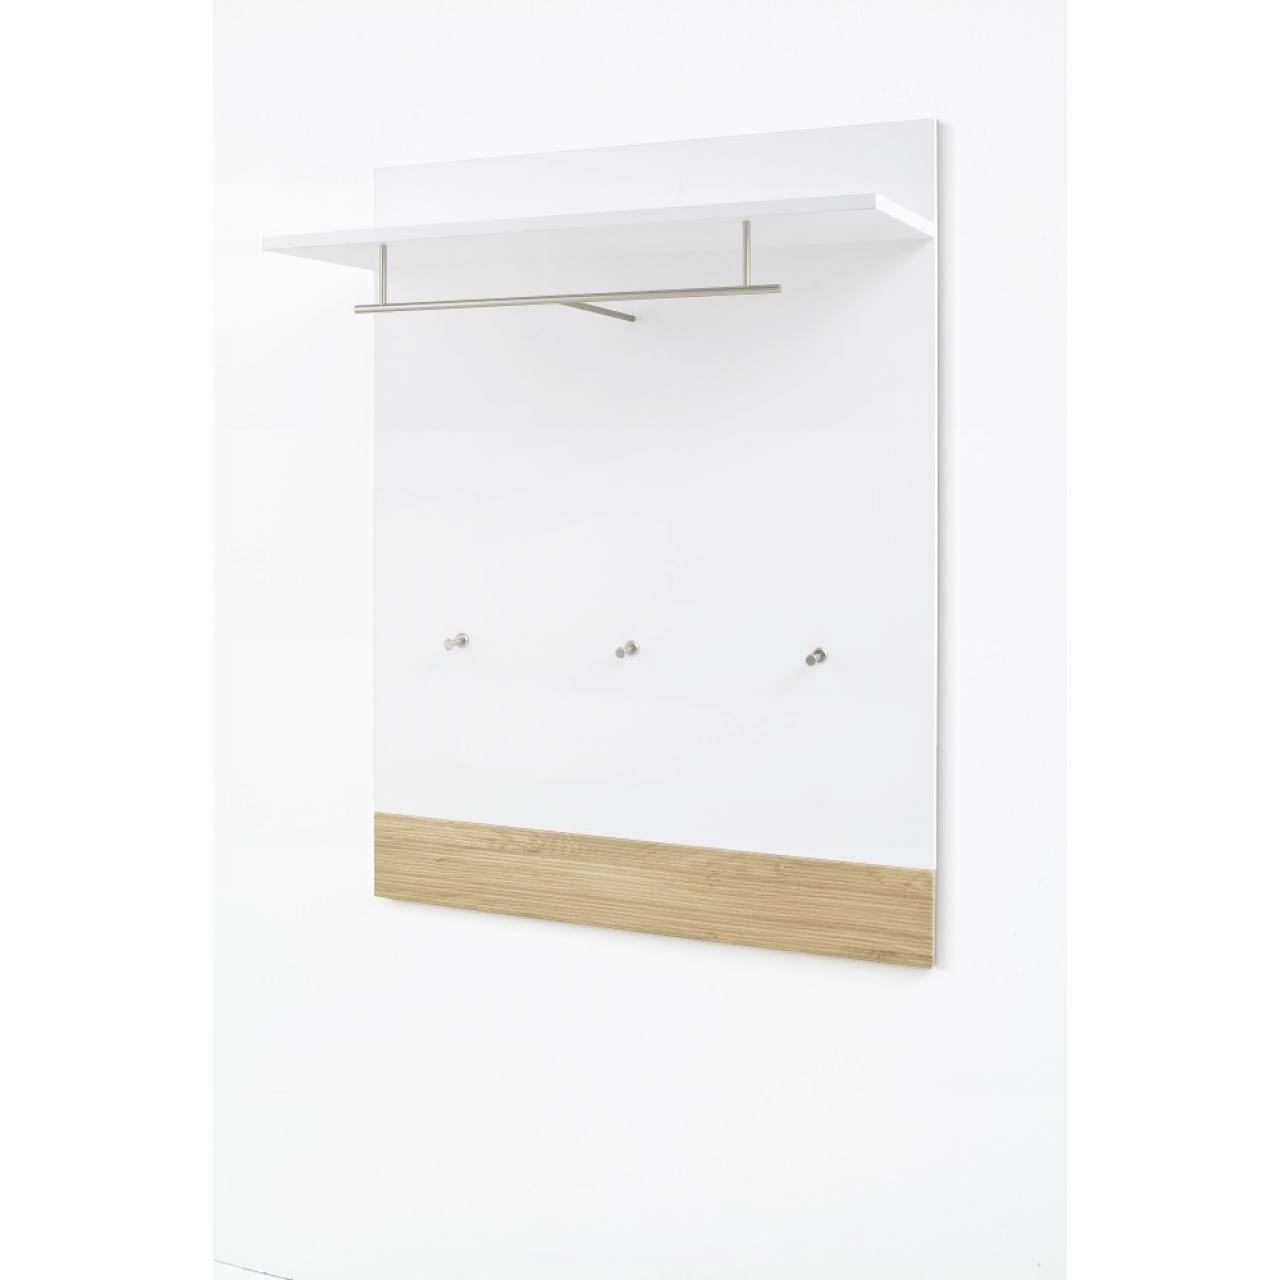 Garderobenpaneel Marlisa - Winchester Oak/Weiss Hochglanz